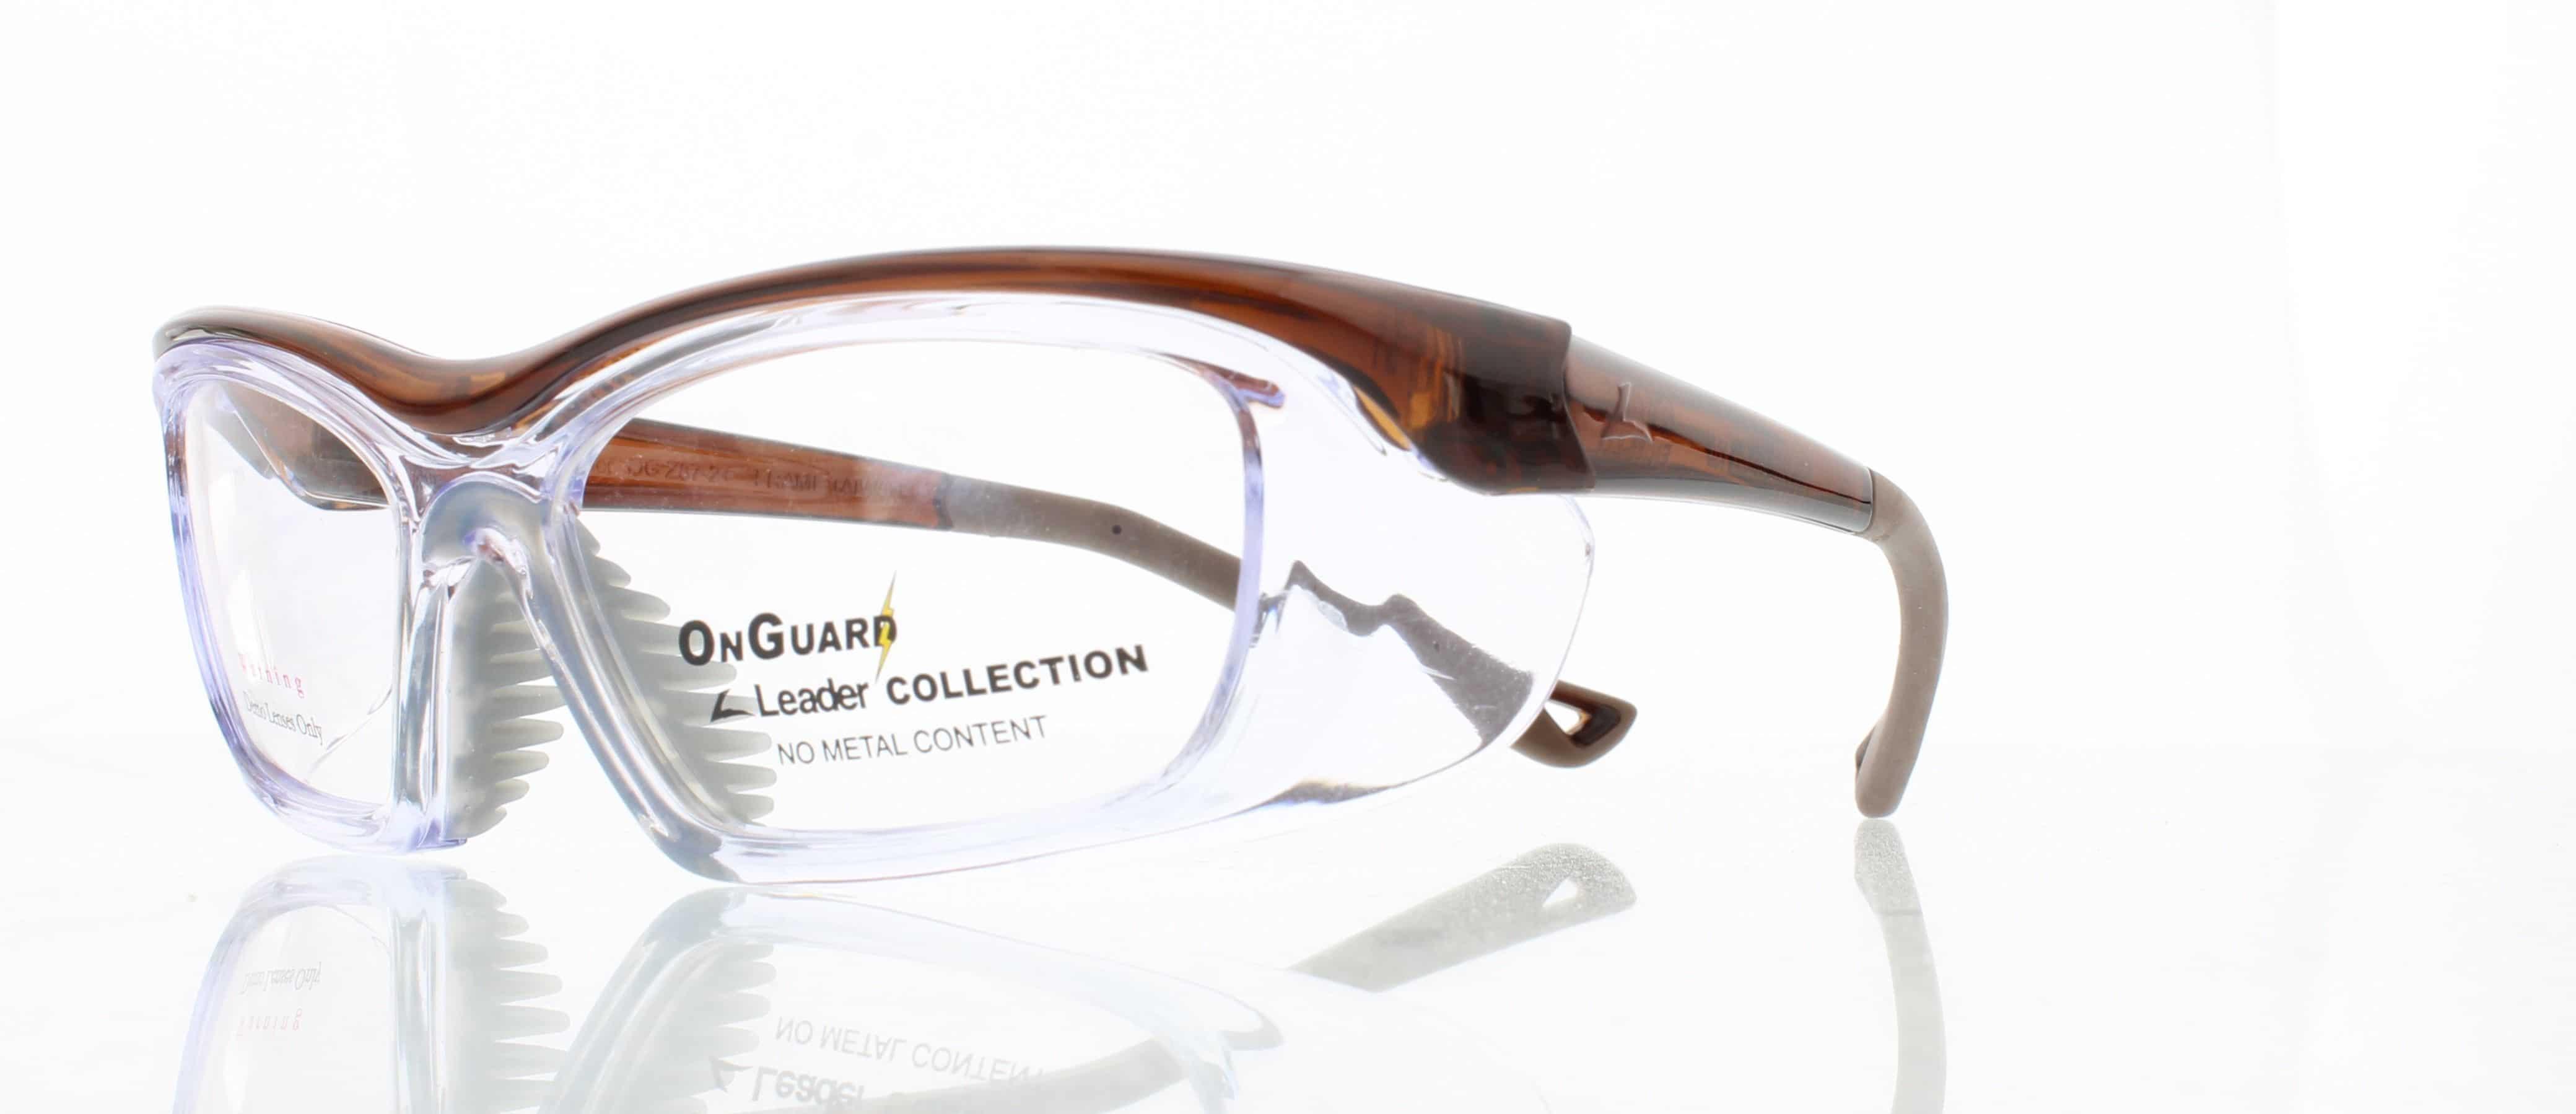 ONGUARD OG220S by OnGuard | Shop Safety Glasses